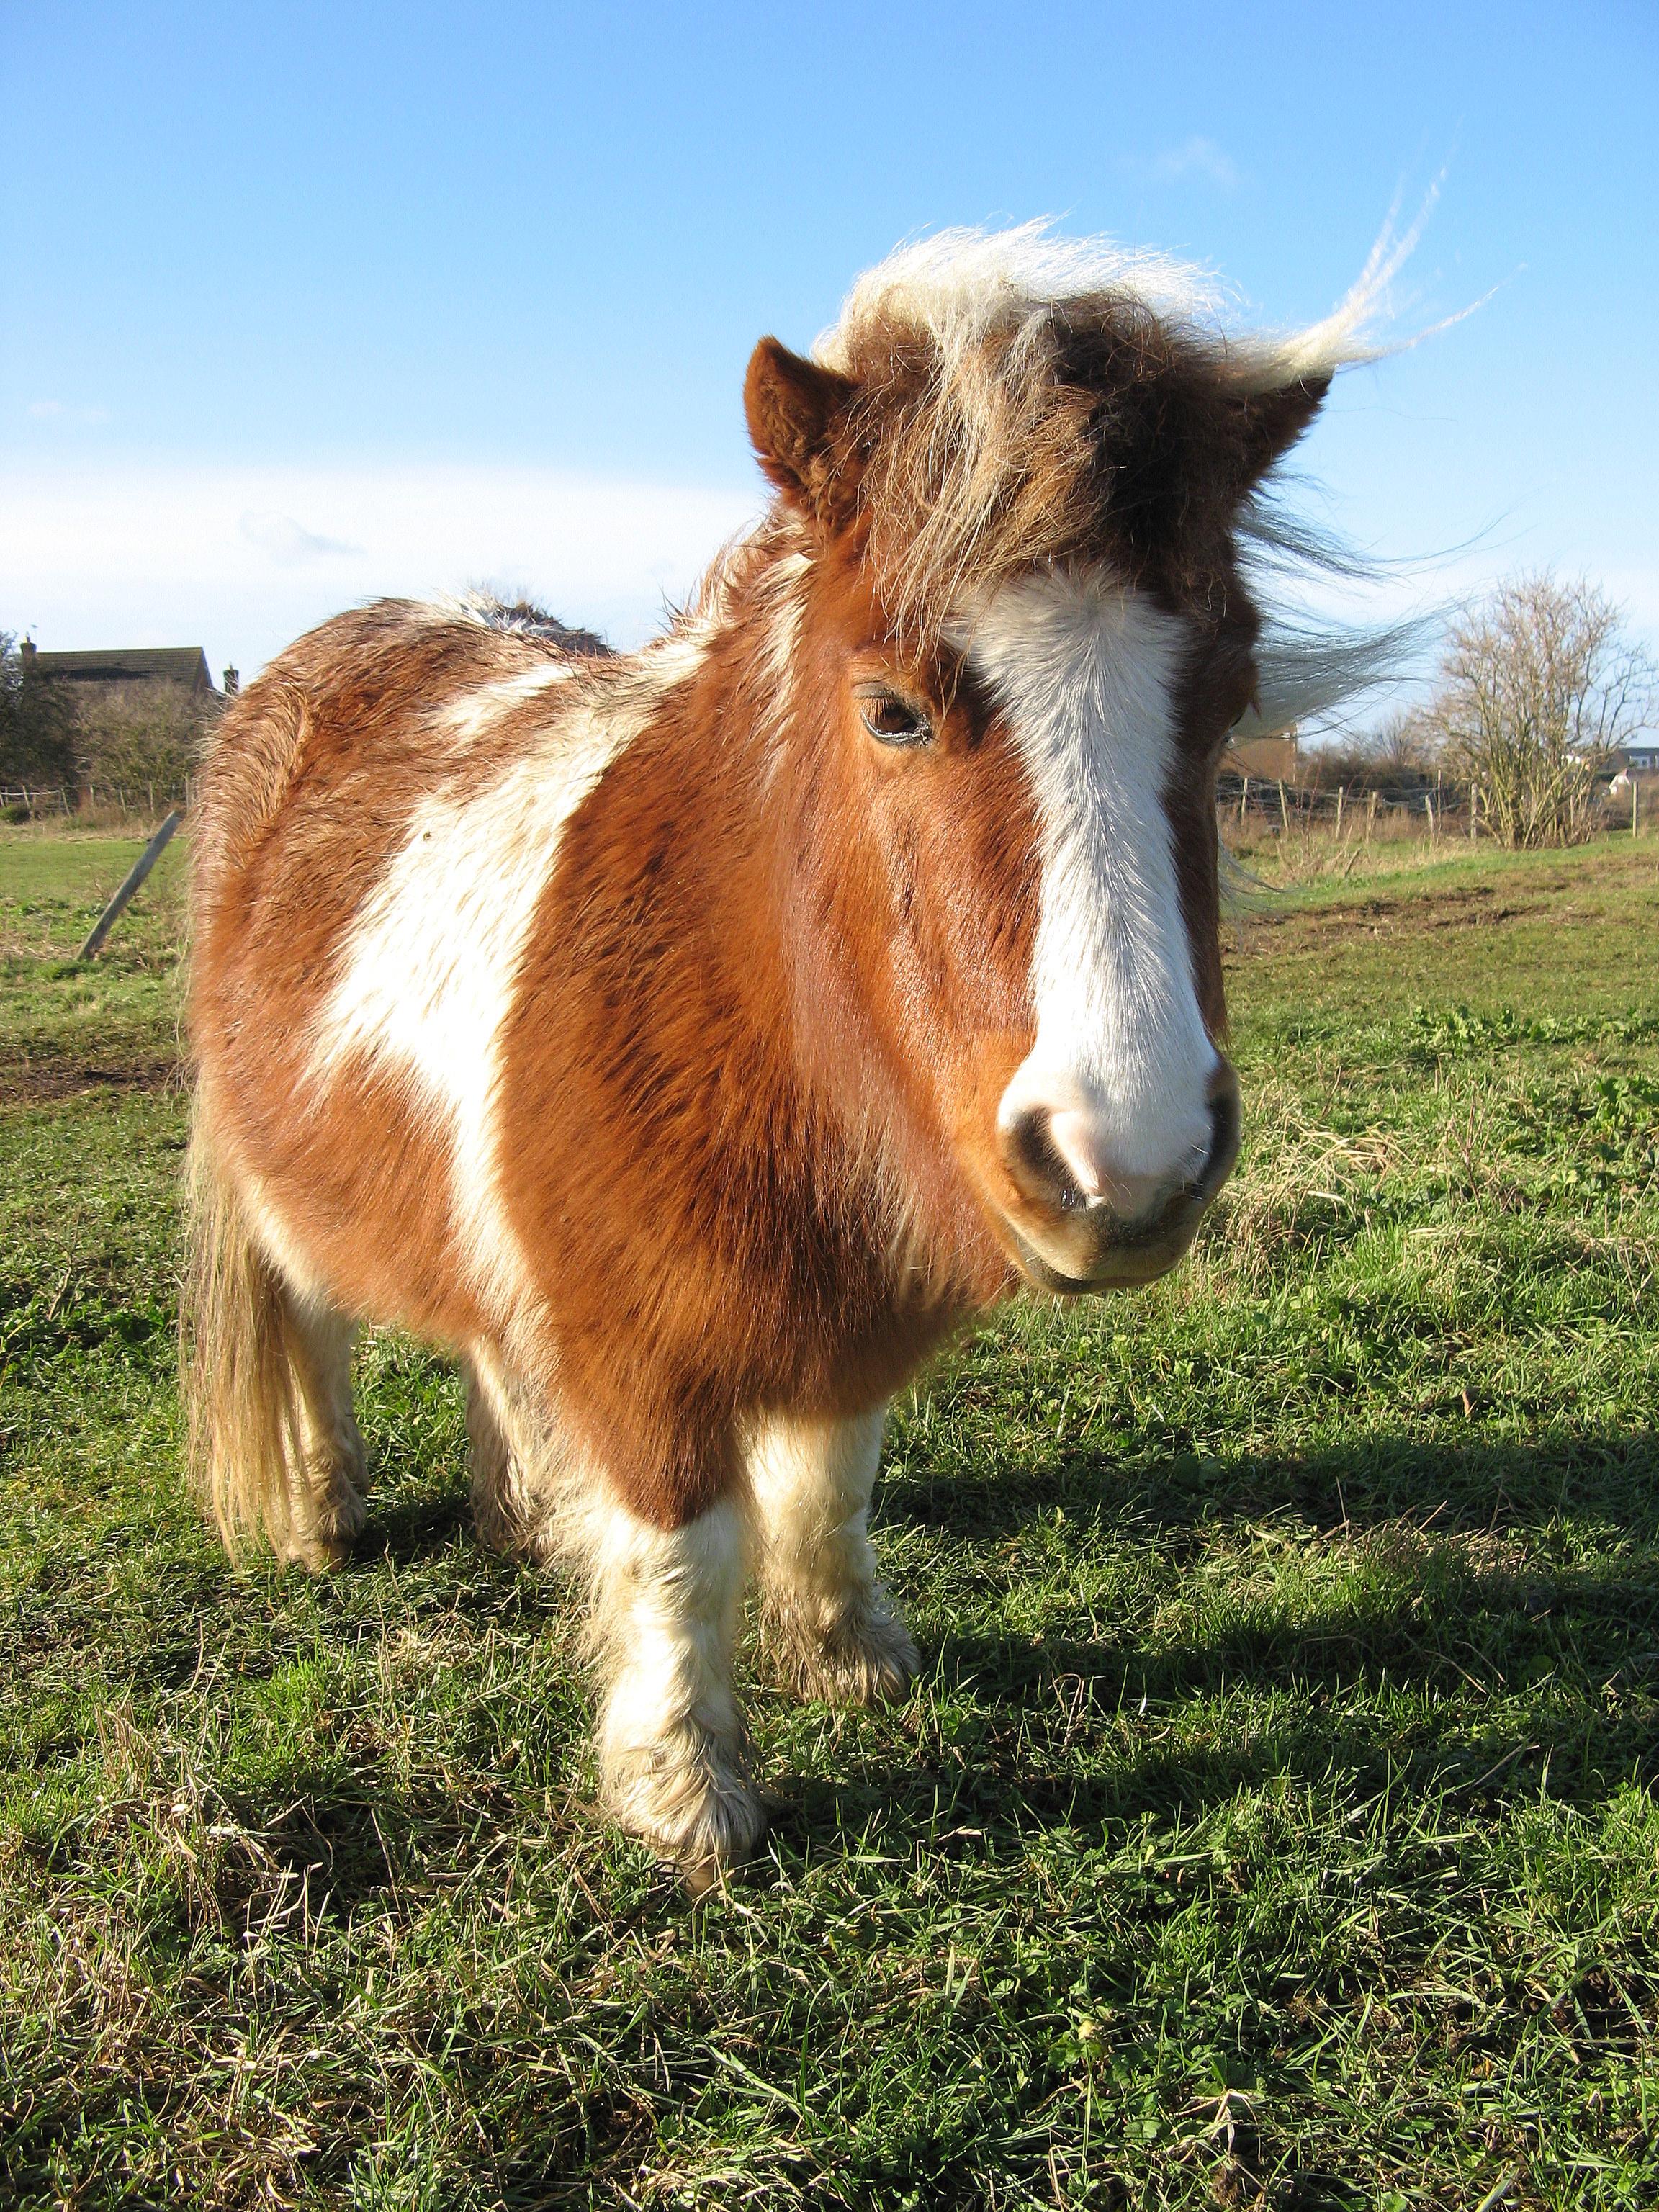 Wallpaper Gif Anime File Shetland Pony 20090117 Jpg Wikimedia Commons